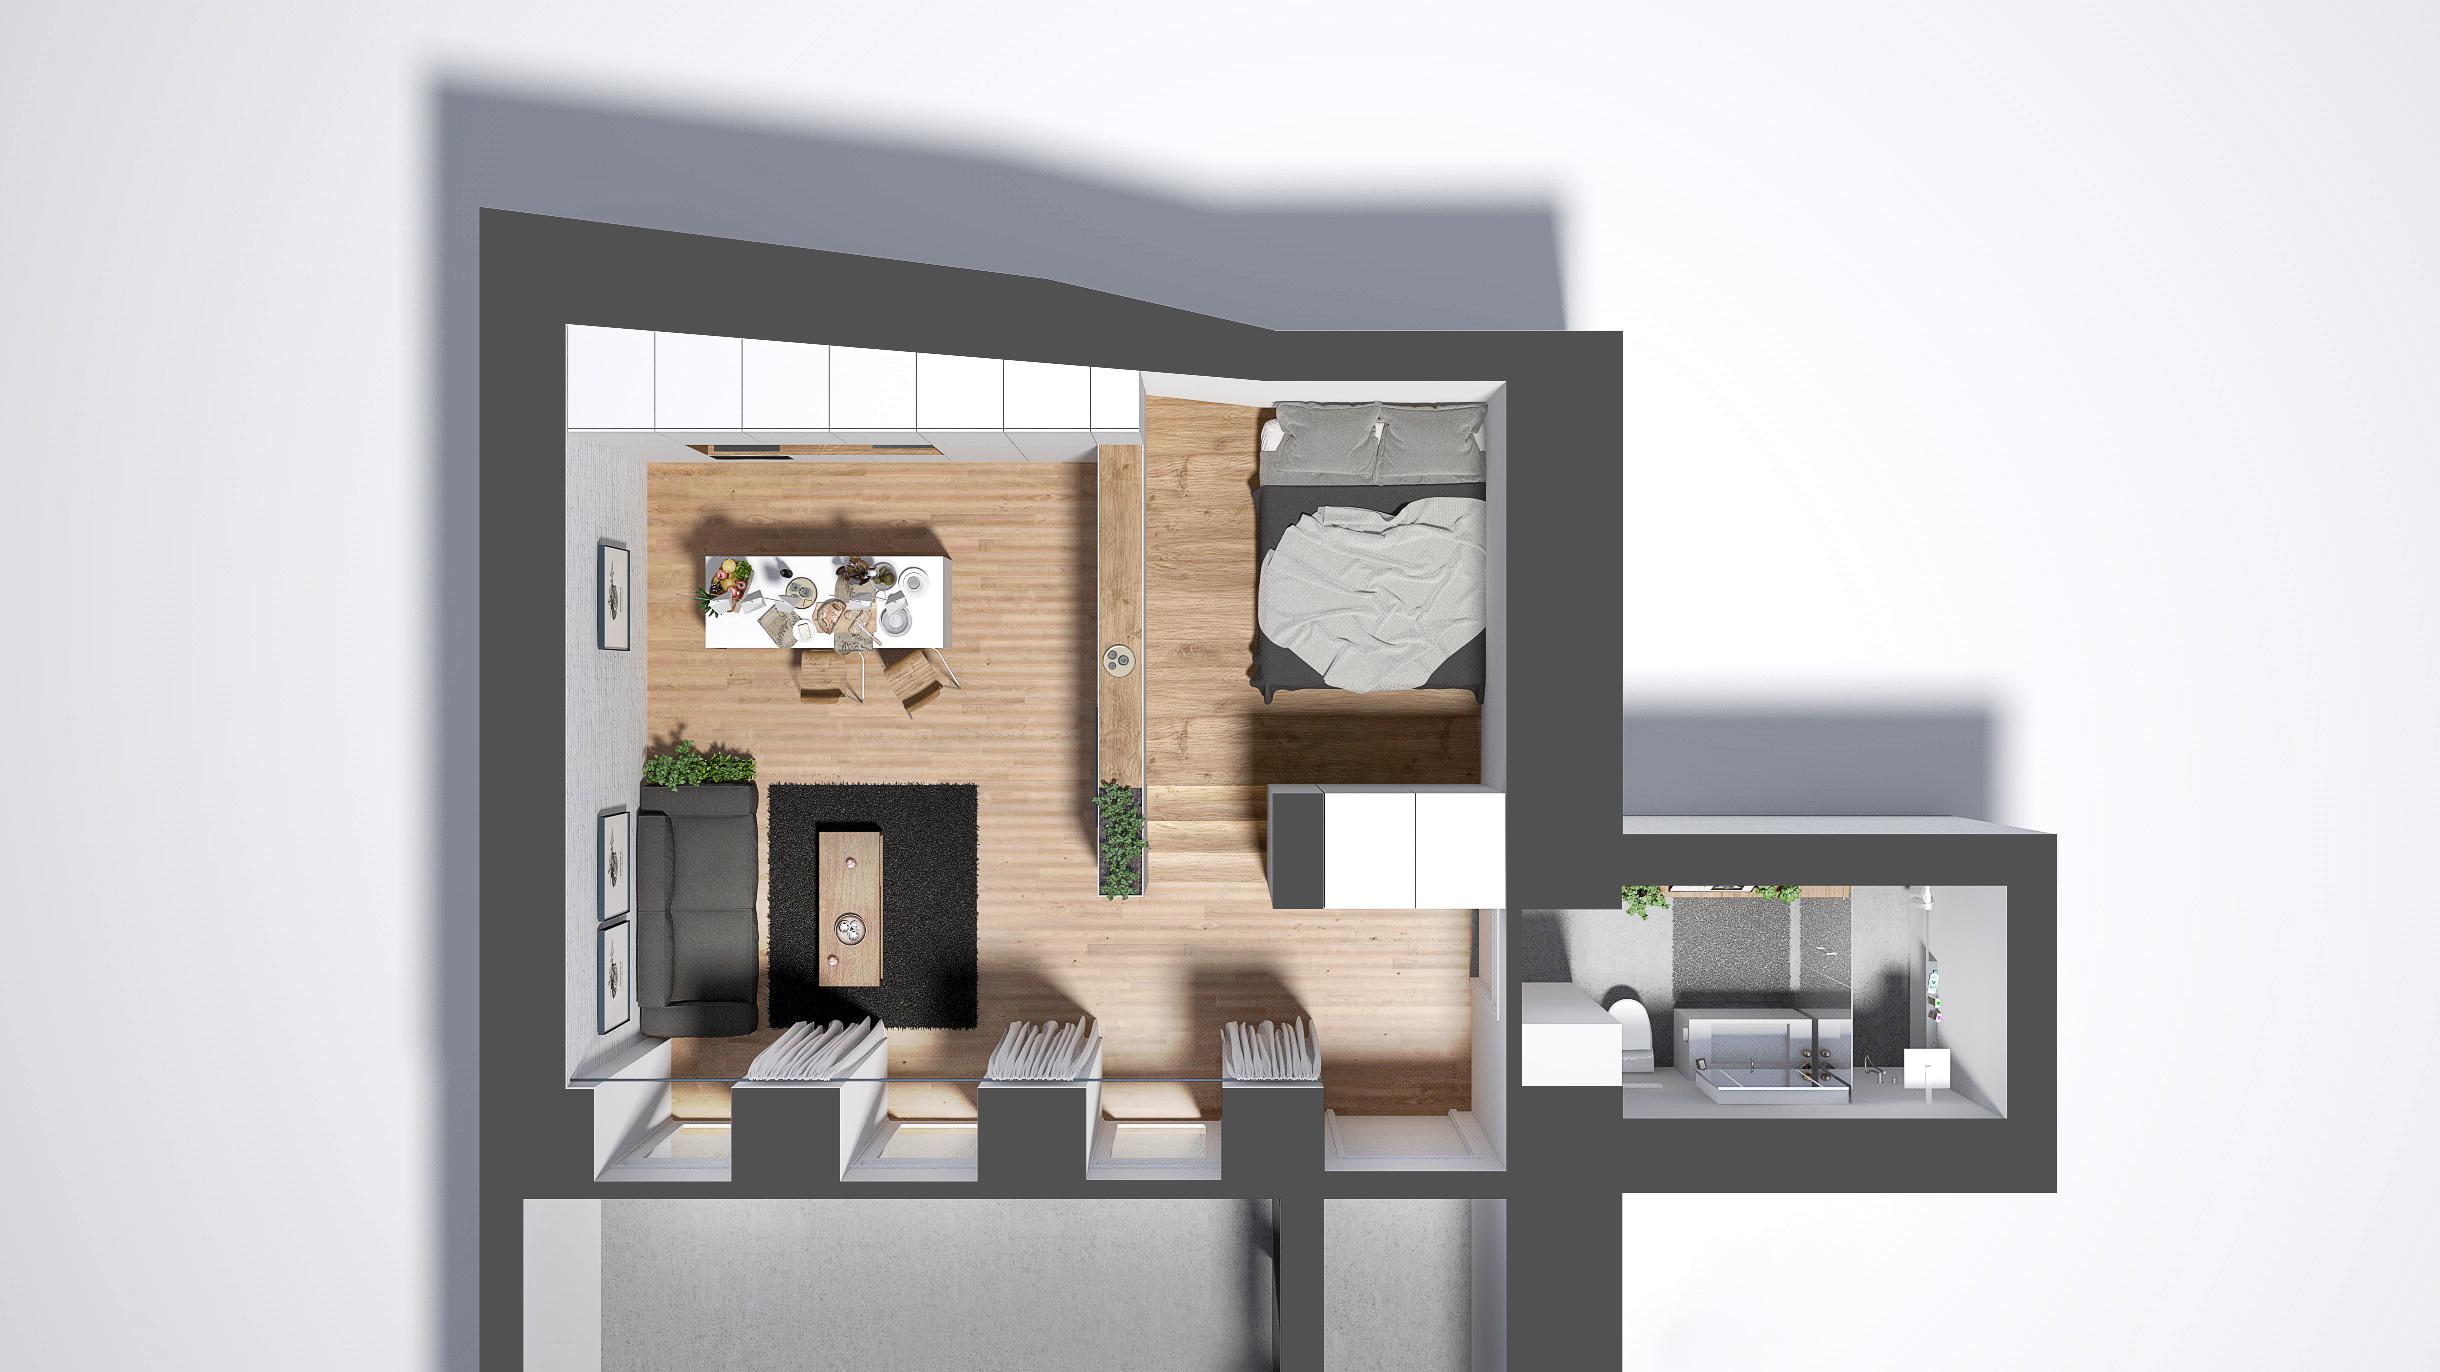 Au_apartments_ (1).jpg